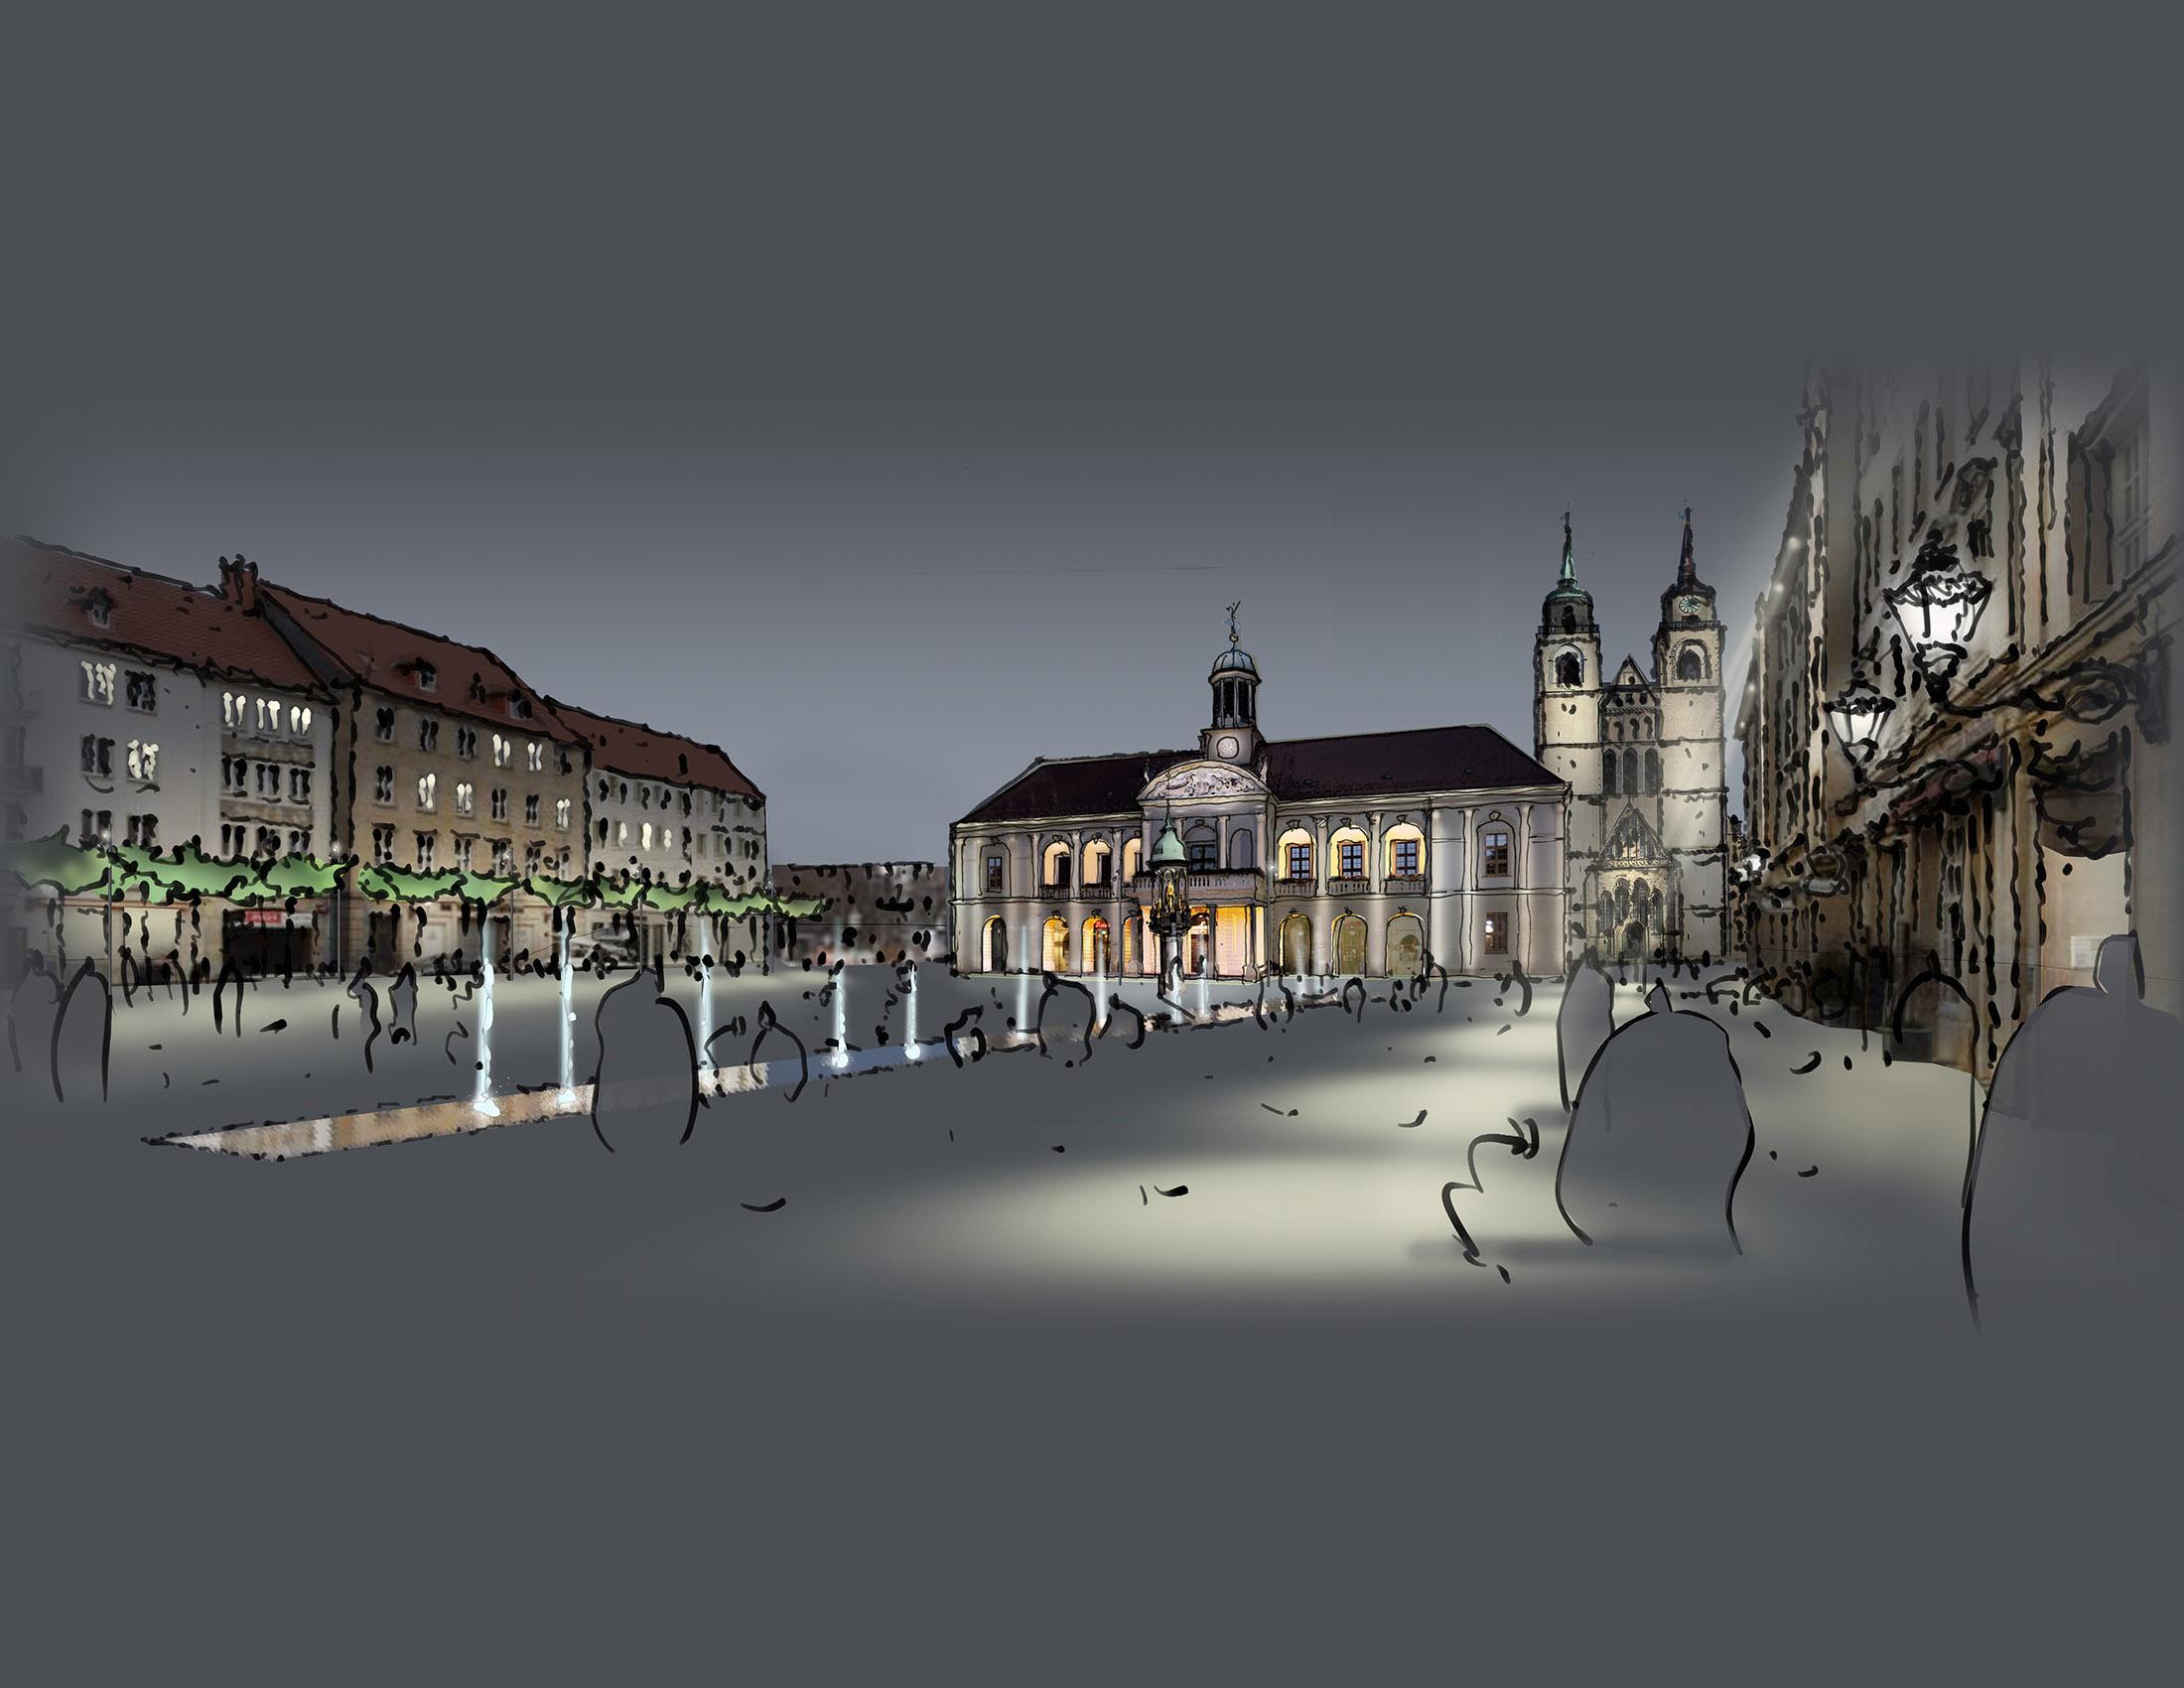 AMM_Alter-Markt-Magdeburg_01b